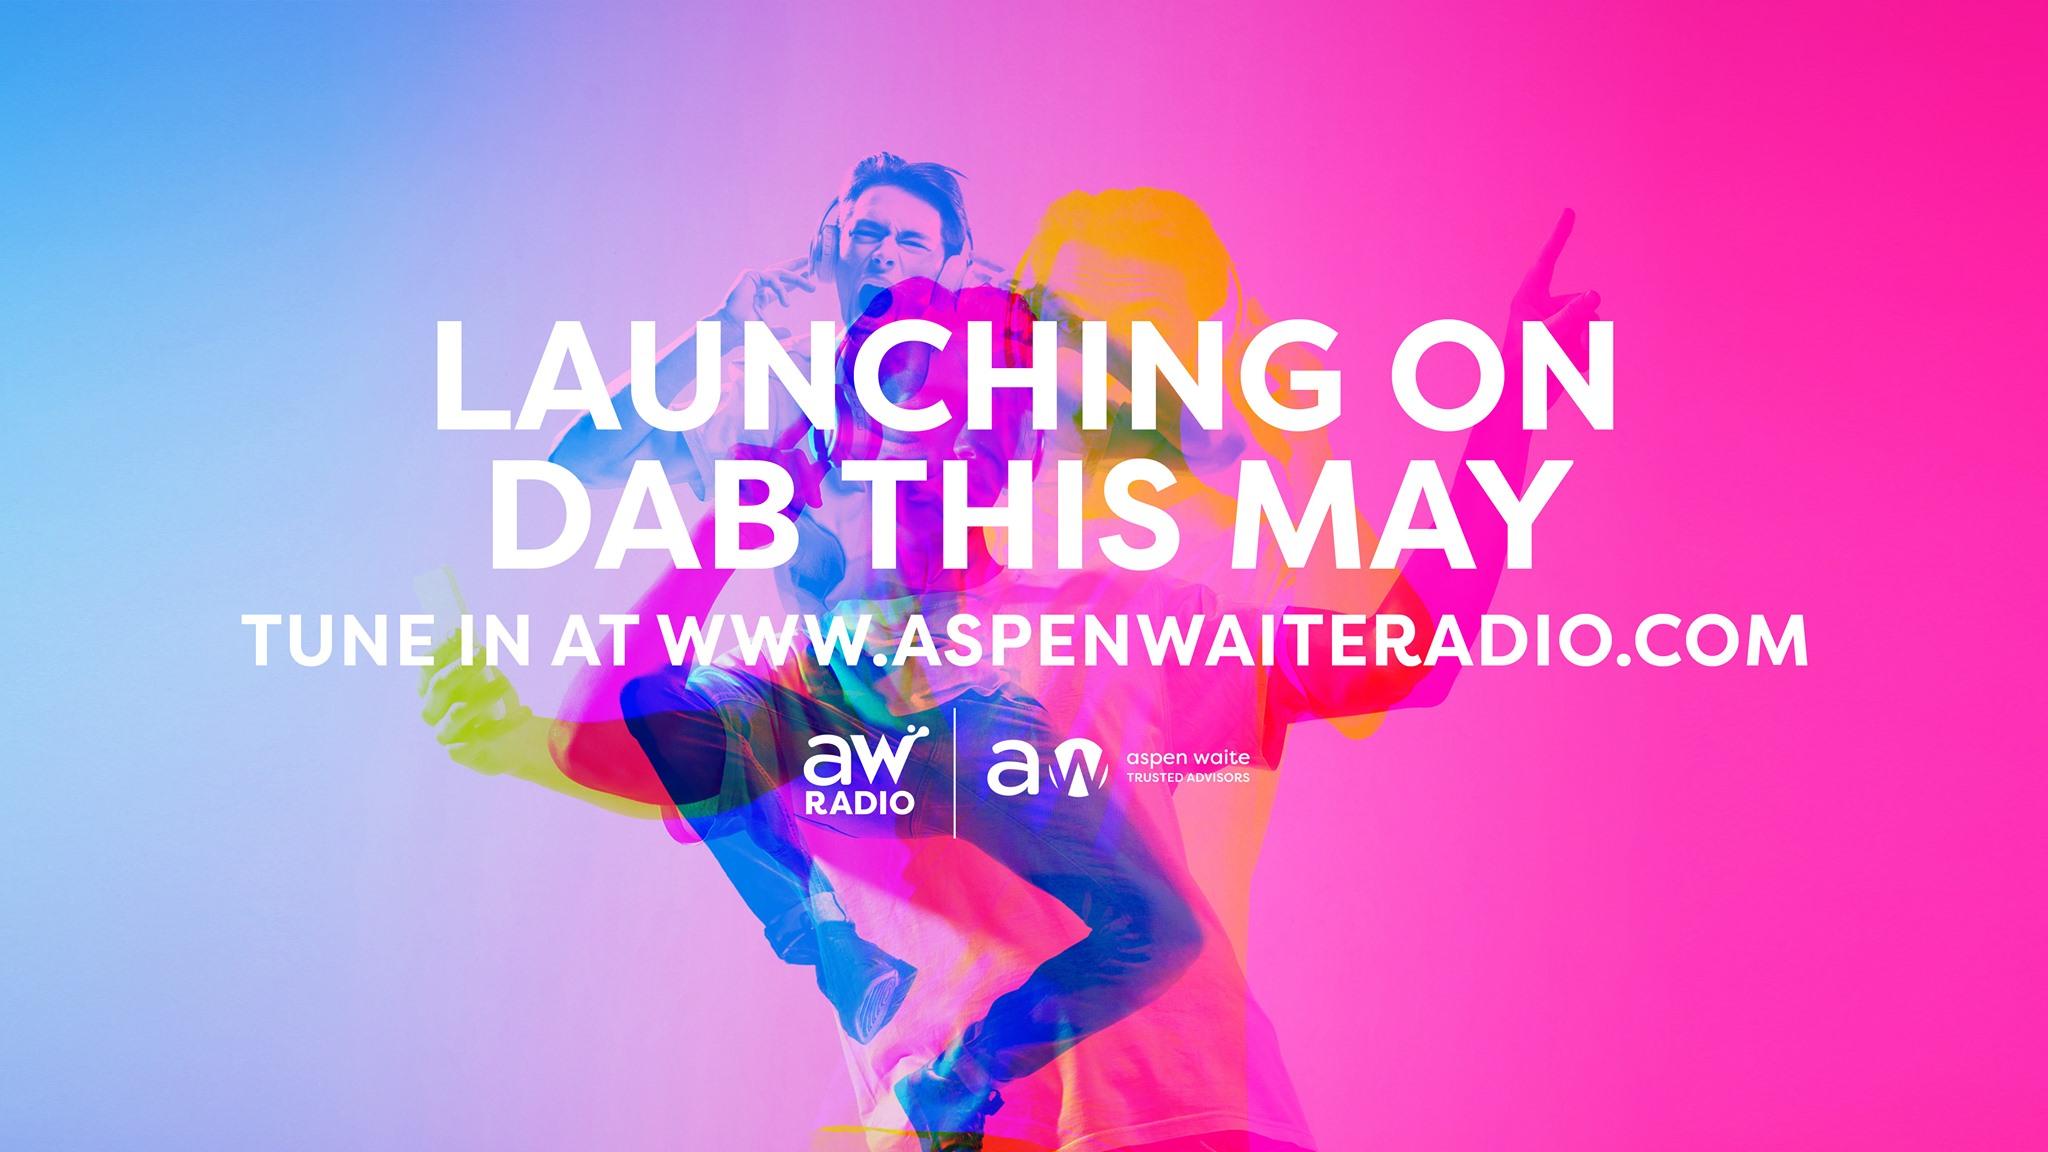 Aspen Waite Radio Goes Live on DAB Across Wales